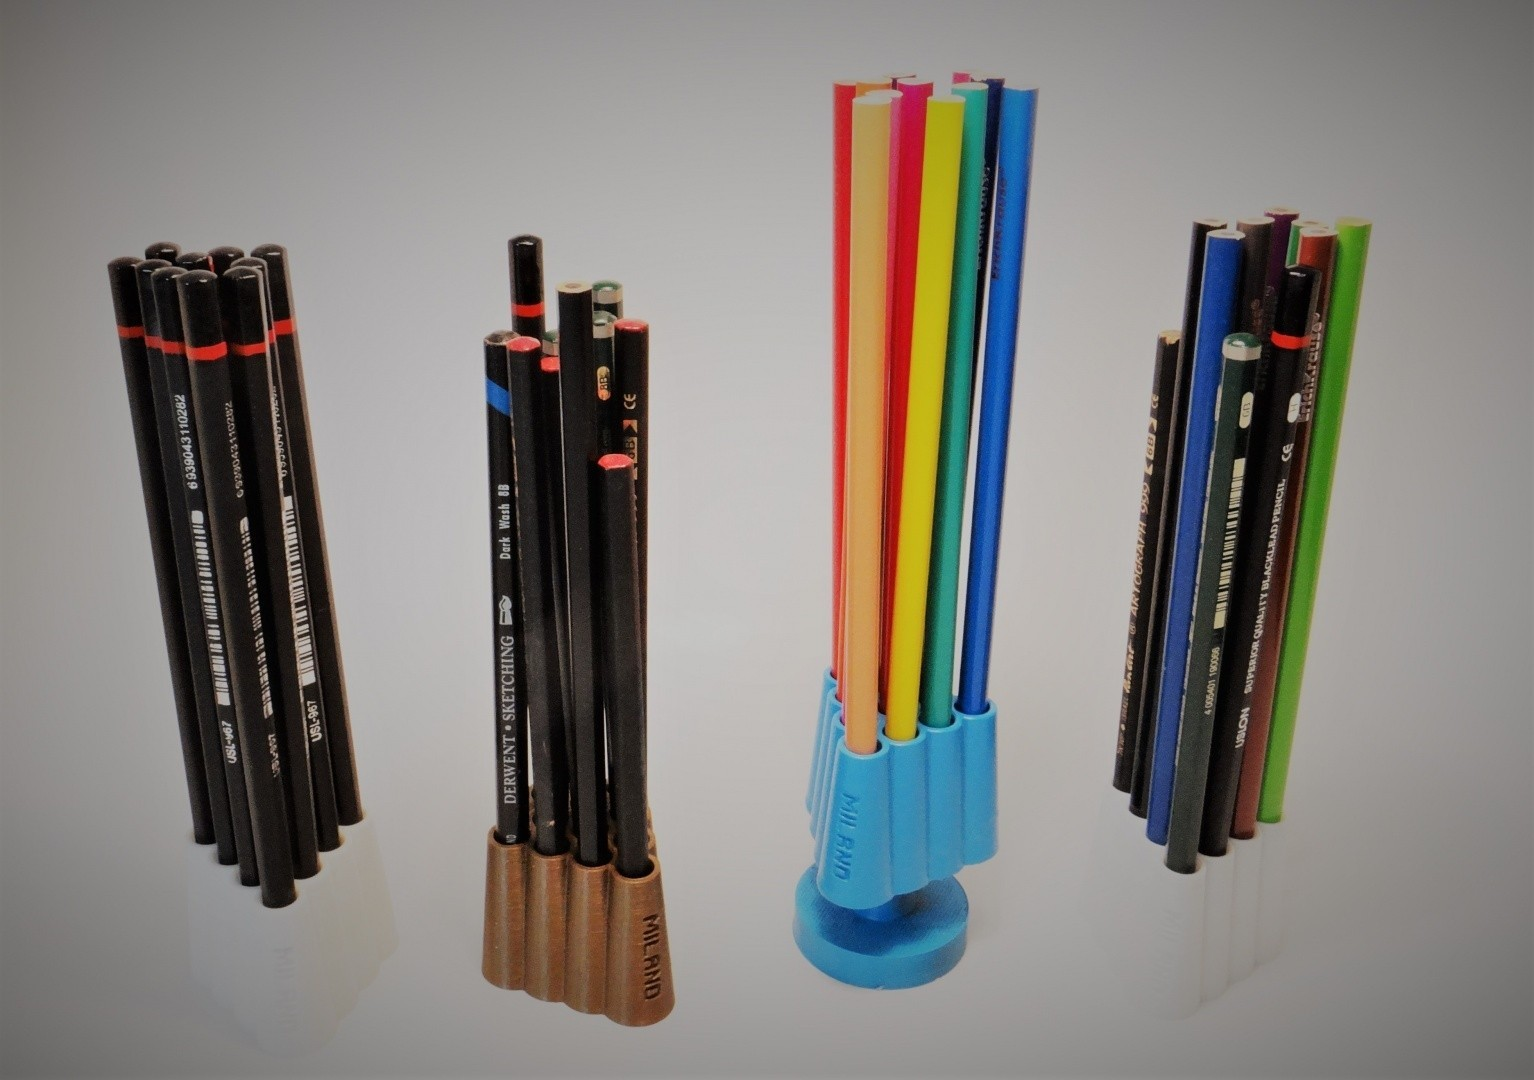 resize-dsc04634.JPG Download free STL file A SIMPLE YET ELEGANT PENCIL HOLDER • 3D printer design, Milanorage